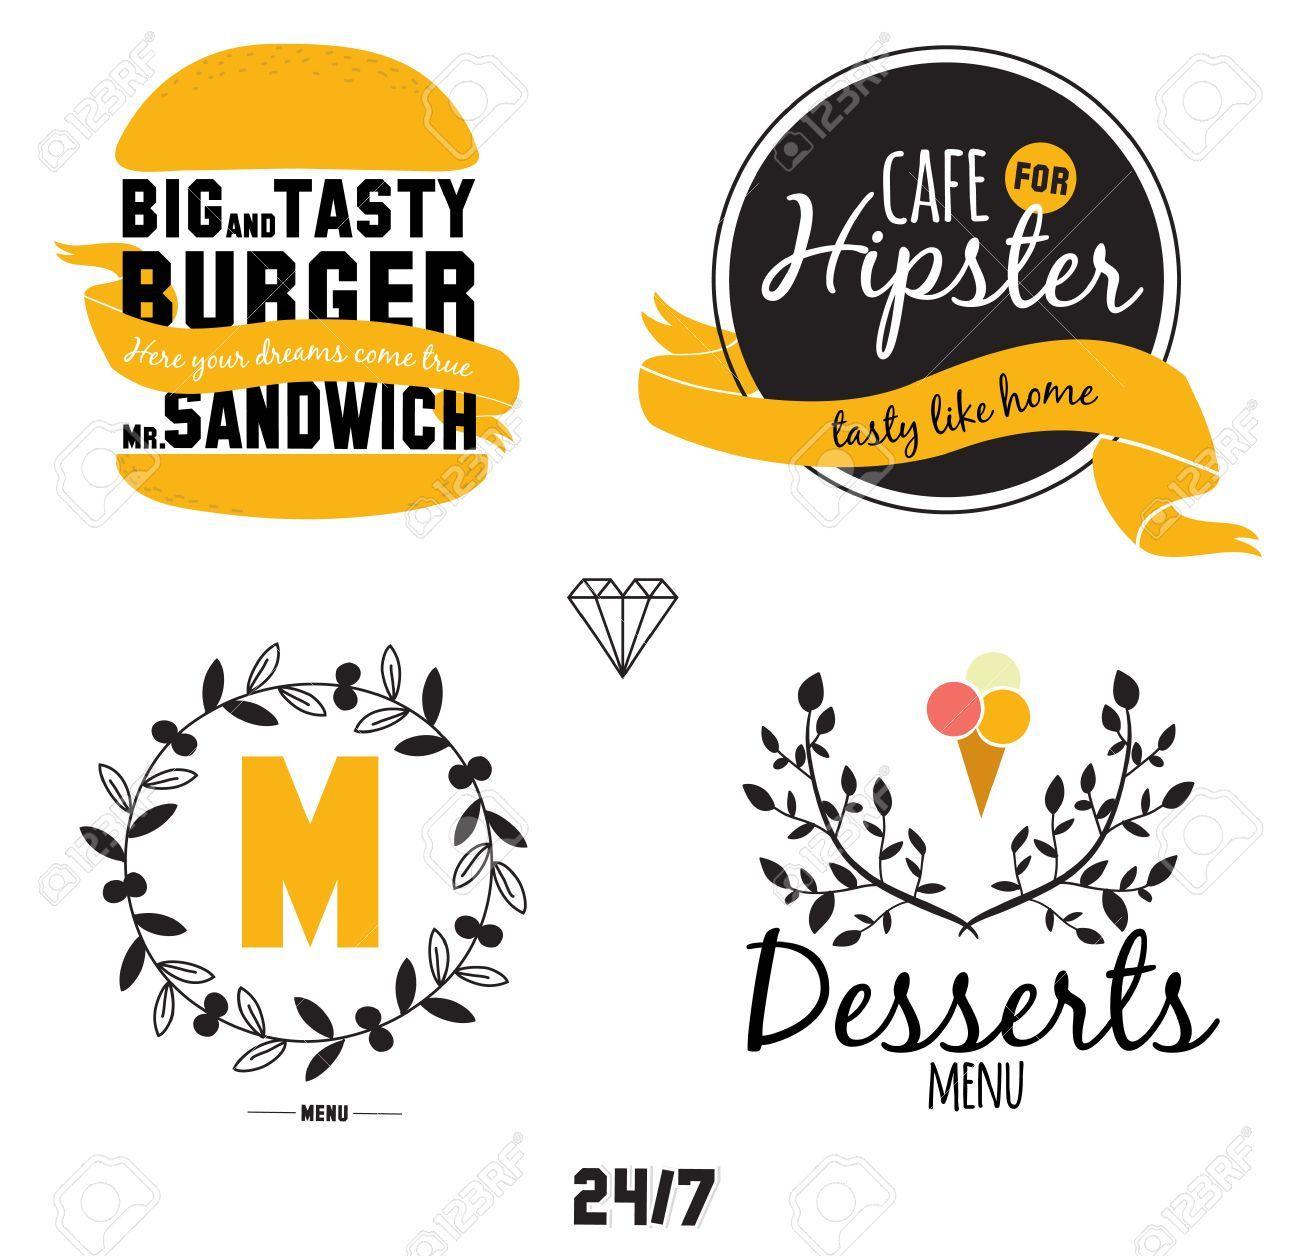 cafe logo template Google Search Cafe menu design